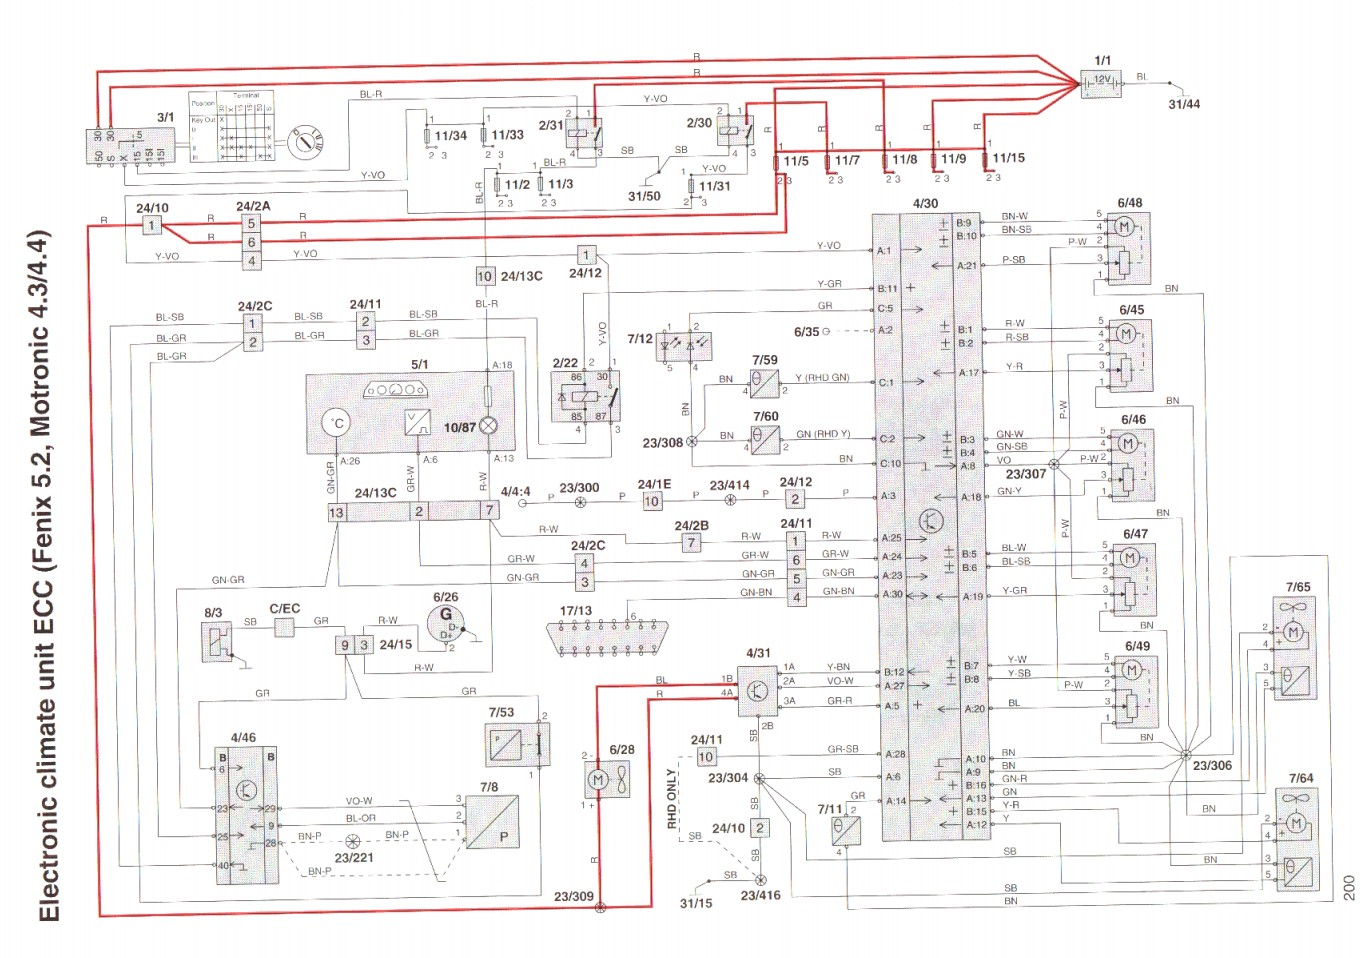 Climate Control ECC Codes & Fan Fix on mercedes e320 wiring diagram, dodge omni wiring diagram, volvo 850 shop manual, volvo 850 suspension, porsche cayenne wiring diagram, saturn aura wiring diagram, volkswagen golf wiring diagram, bmw e90 wiring diagram, pontiac trans sport wiring diagram, mitsubishi starion wiring diagram, chevrolet hhr wiring diagram, volvo amazon wiring diagram, honda ascot wiring diagram, chevrolet volt wiring diagram, volvo ignition wiring diagram, chrysler crossfire wiring diagram, mercury milan wiring diagram, volvo 850 water pump, geo storm wiring diagram, volkswagen cabrio wiring diagram,